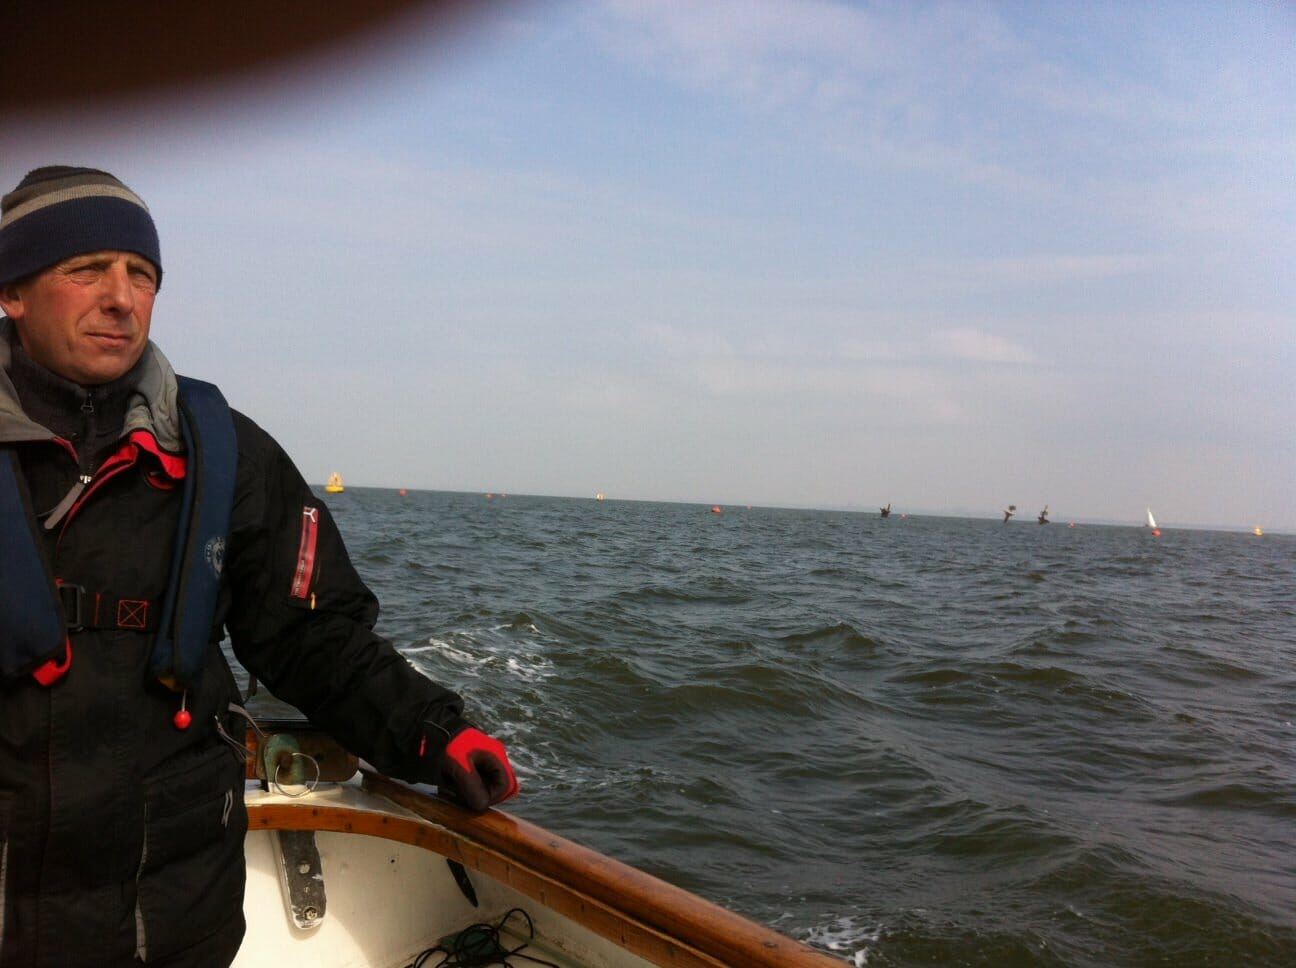 Heading back across the estuary